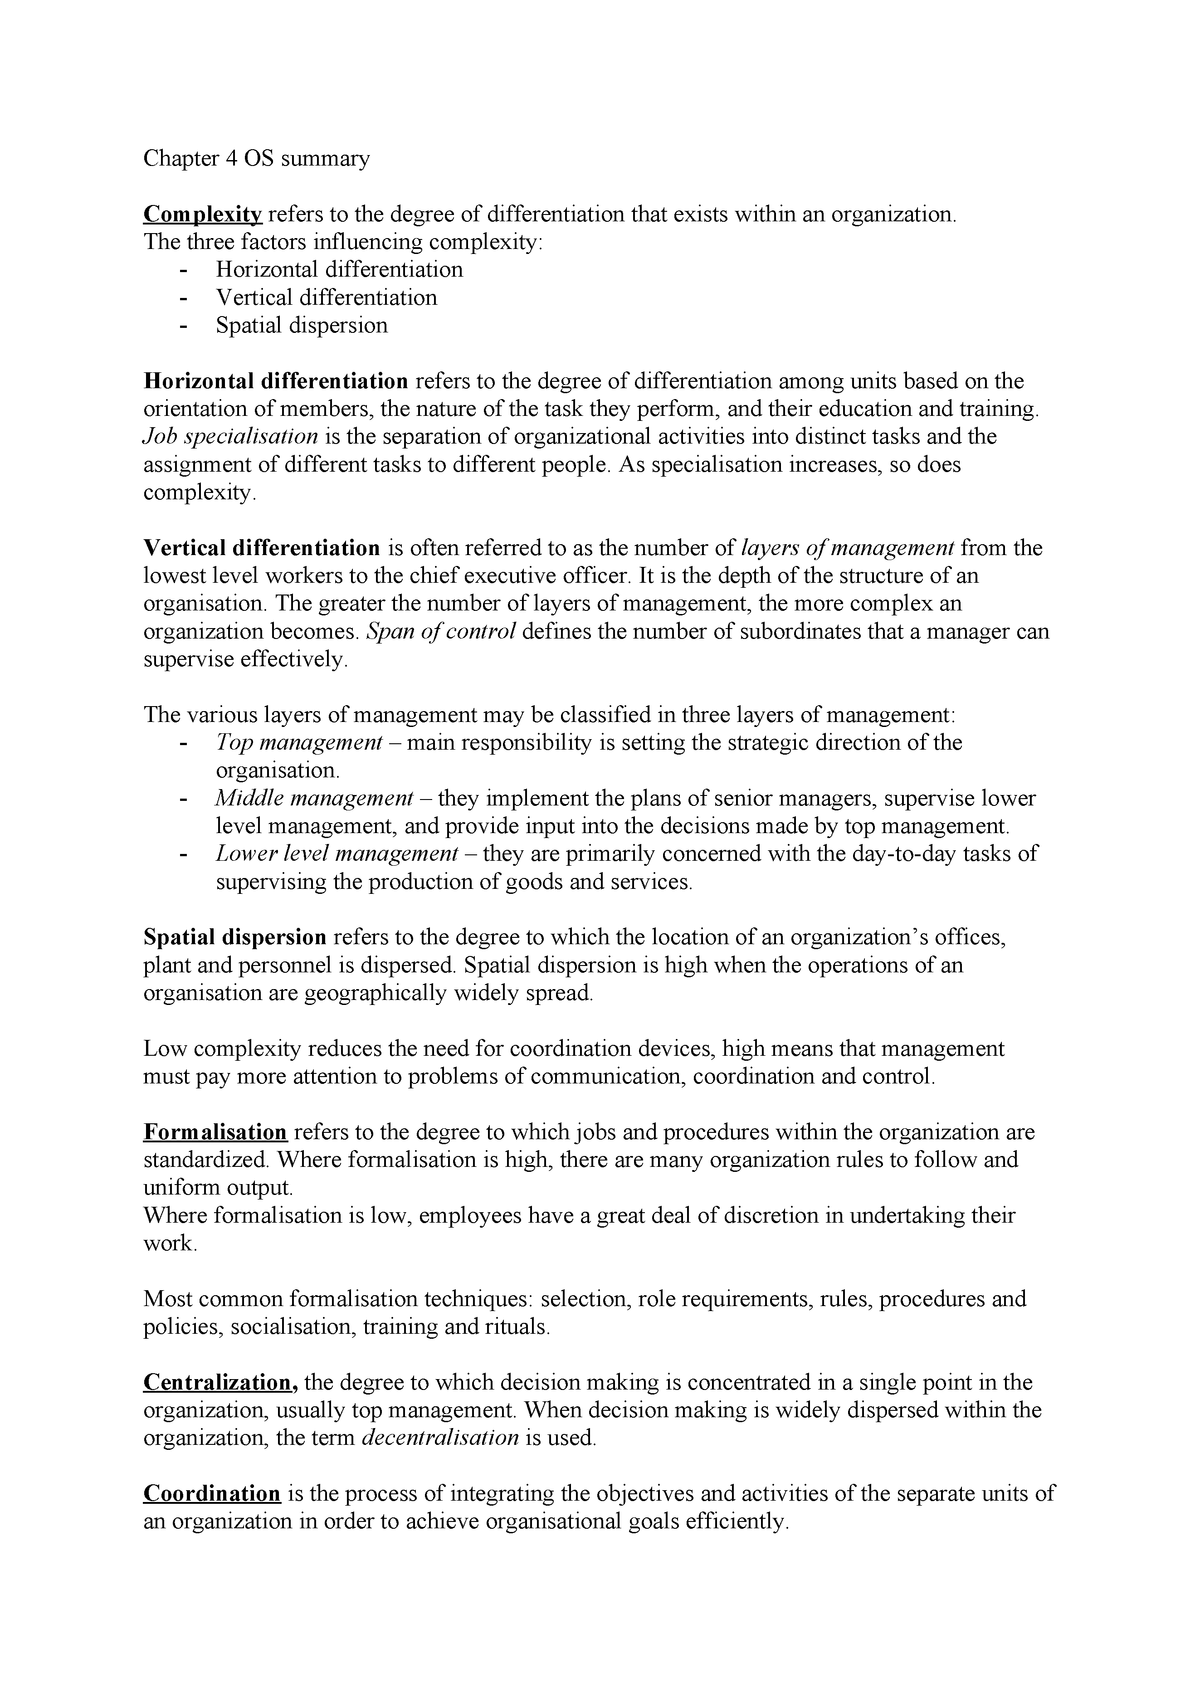 Chapter 4 OS summary - EBP670C05 - StudeerSnel nl